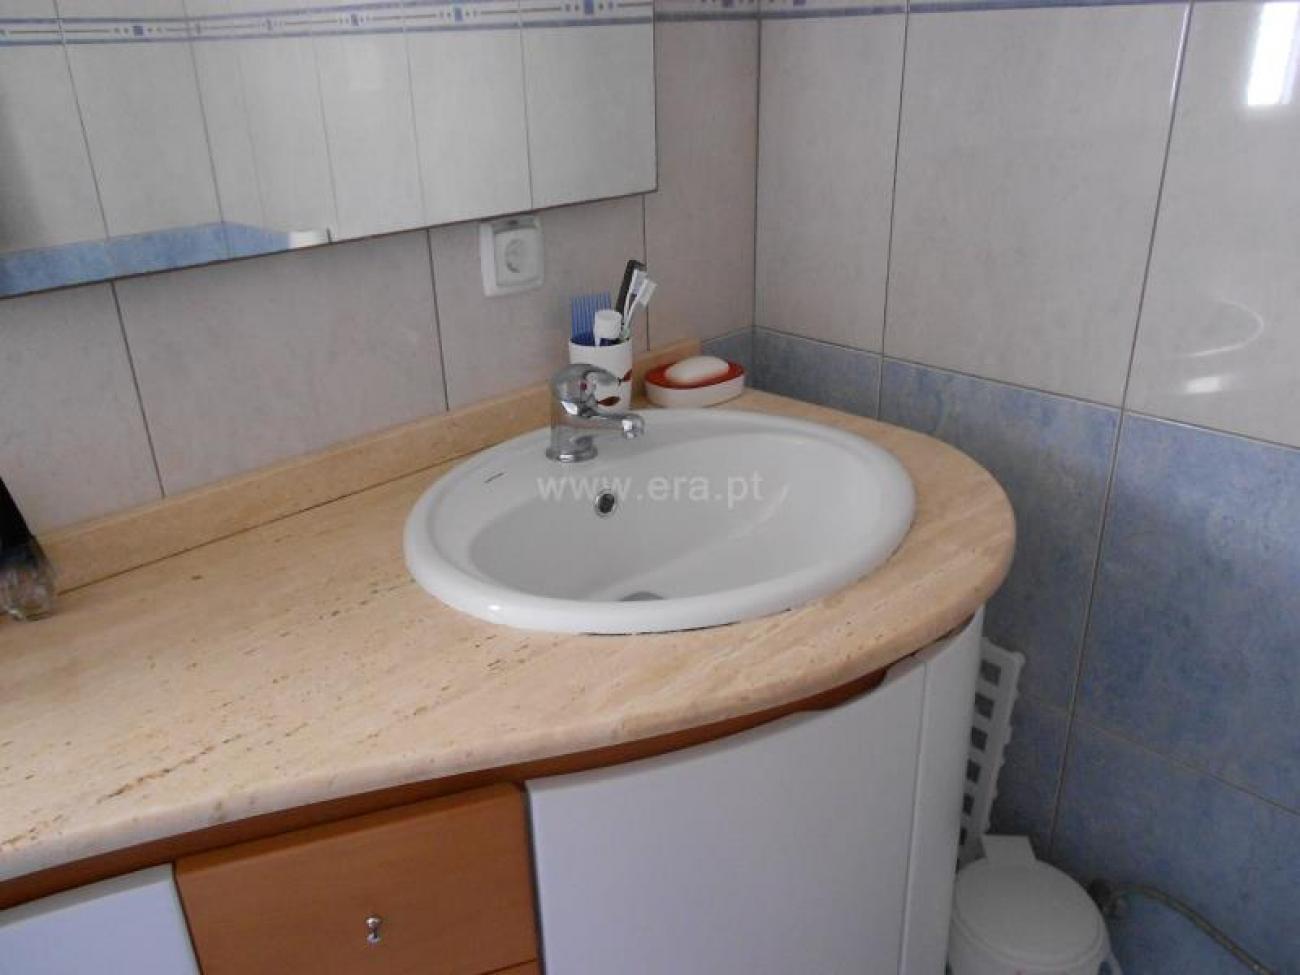 y23_lavabo.jpg